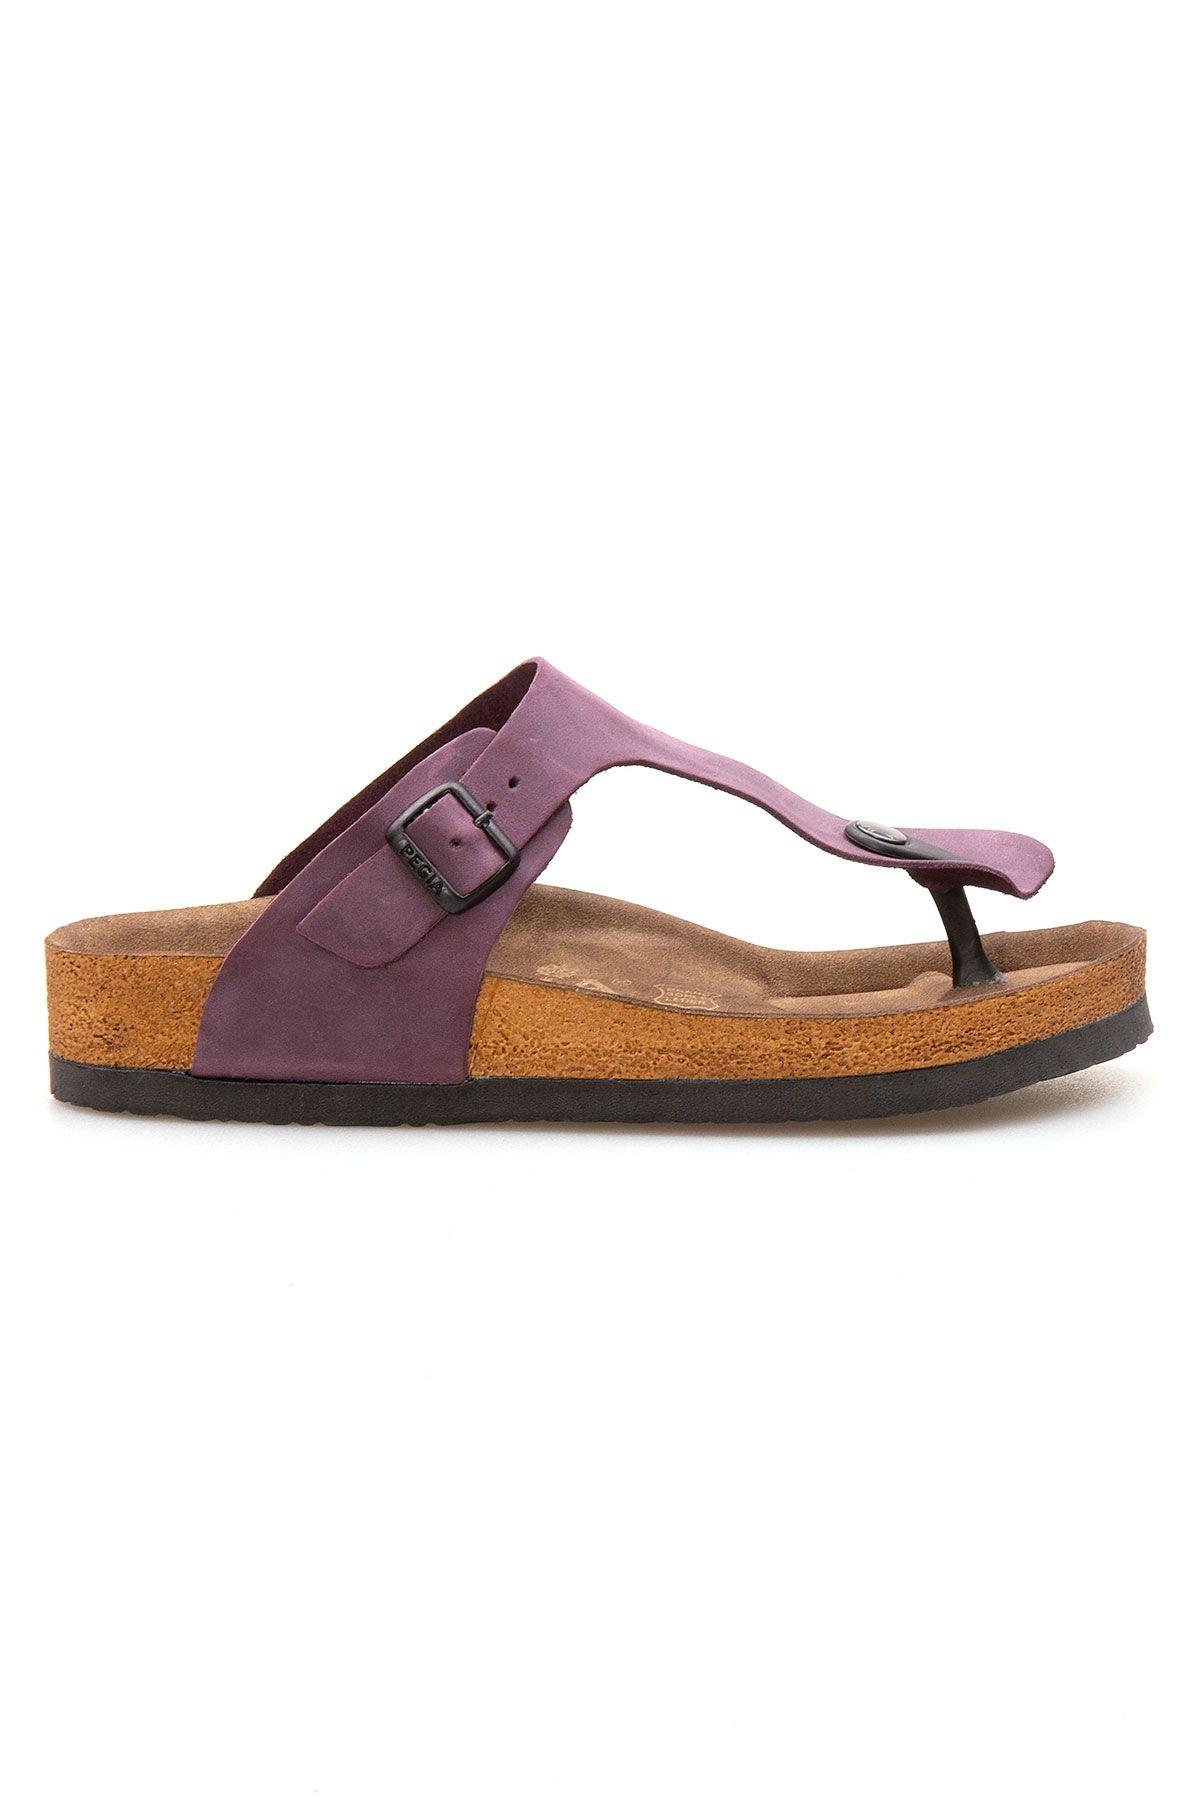 Pegia Genuine Leather Women's Flip Flops 215511 Purple